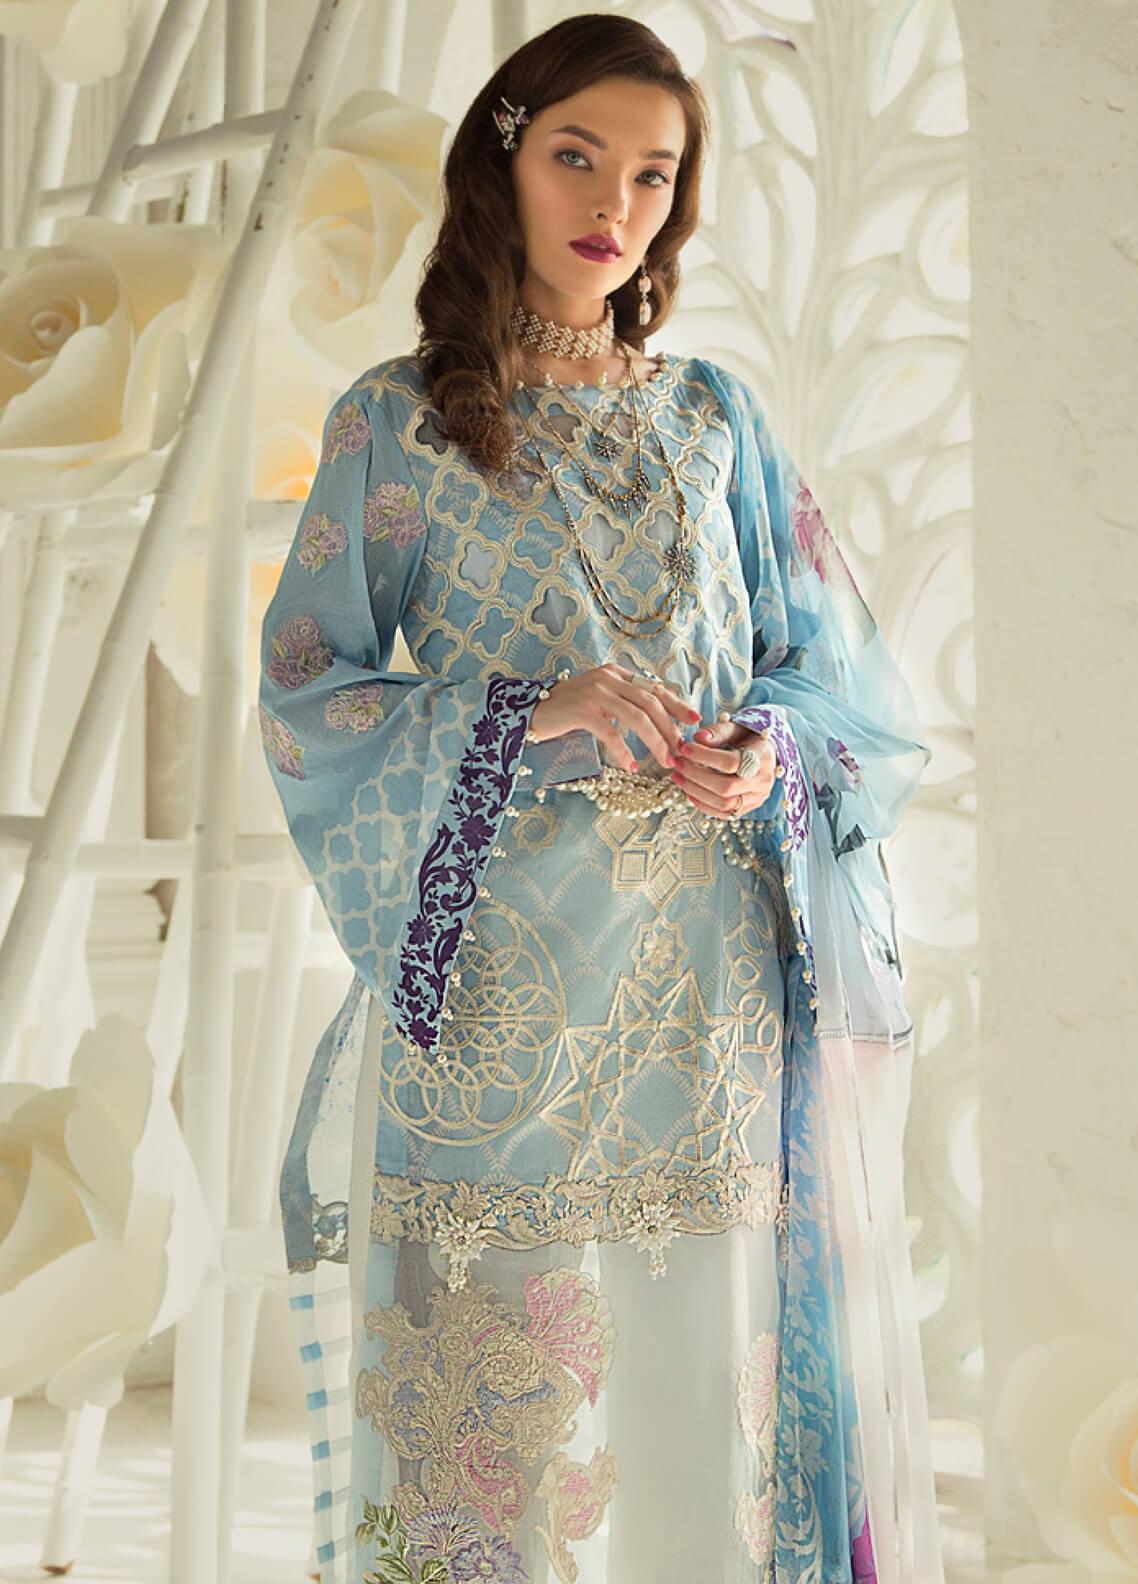 Rouche Embroidered Lawn Unstitched 3 Piece Suit RCH19L 9 SEA SHINE - Festive Collection